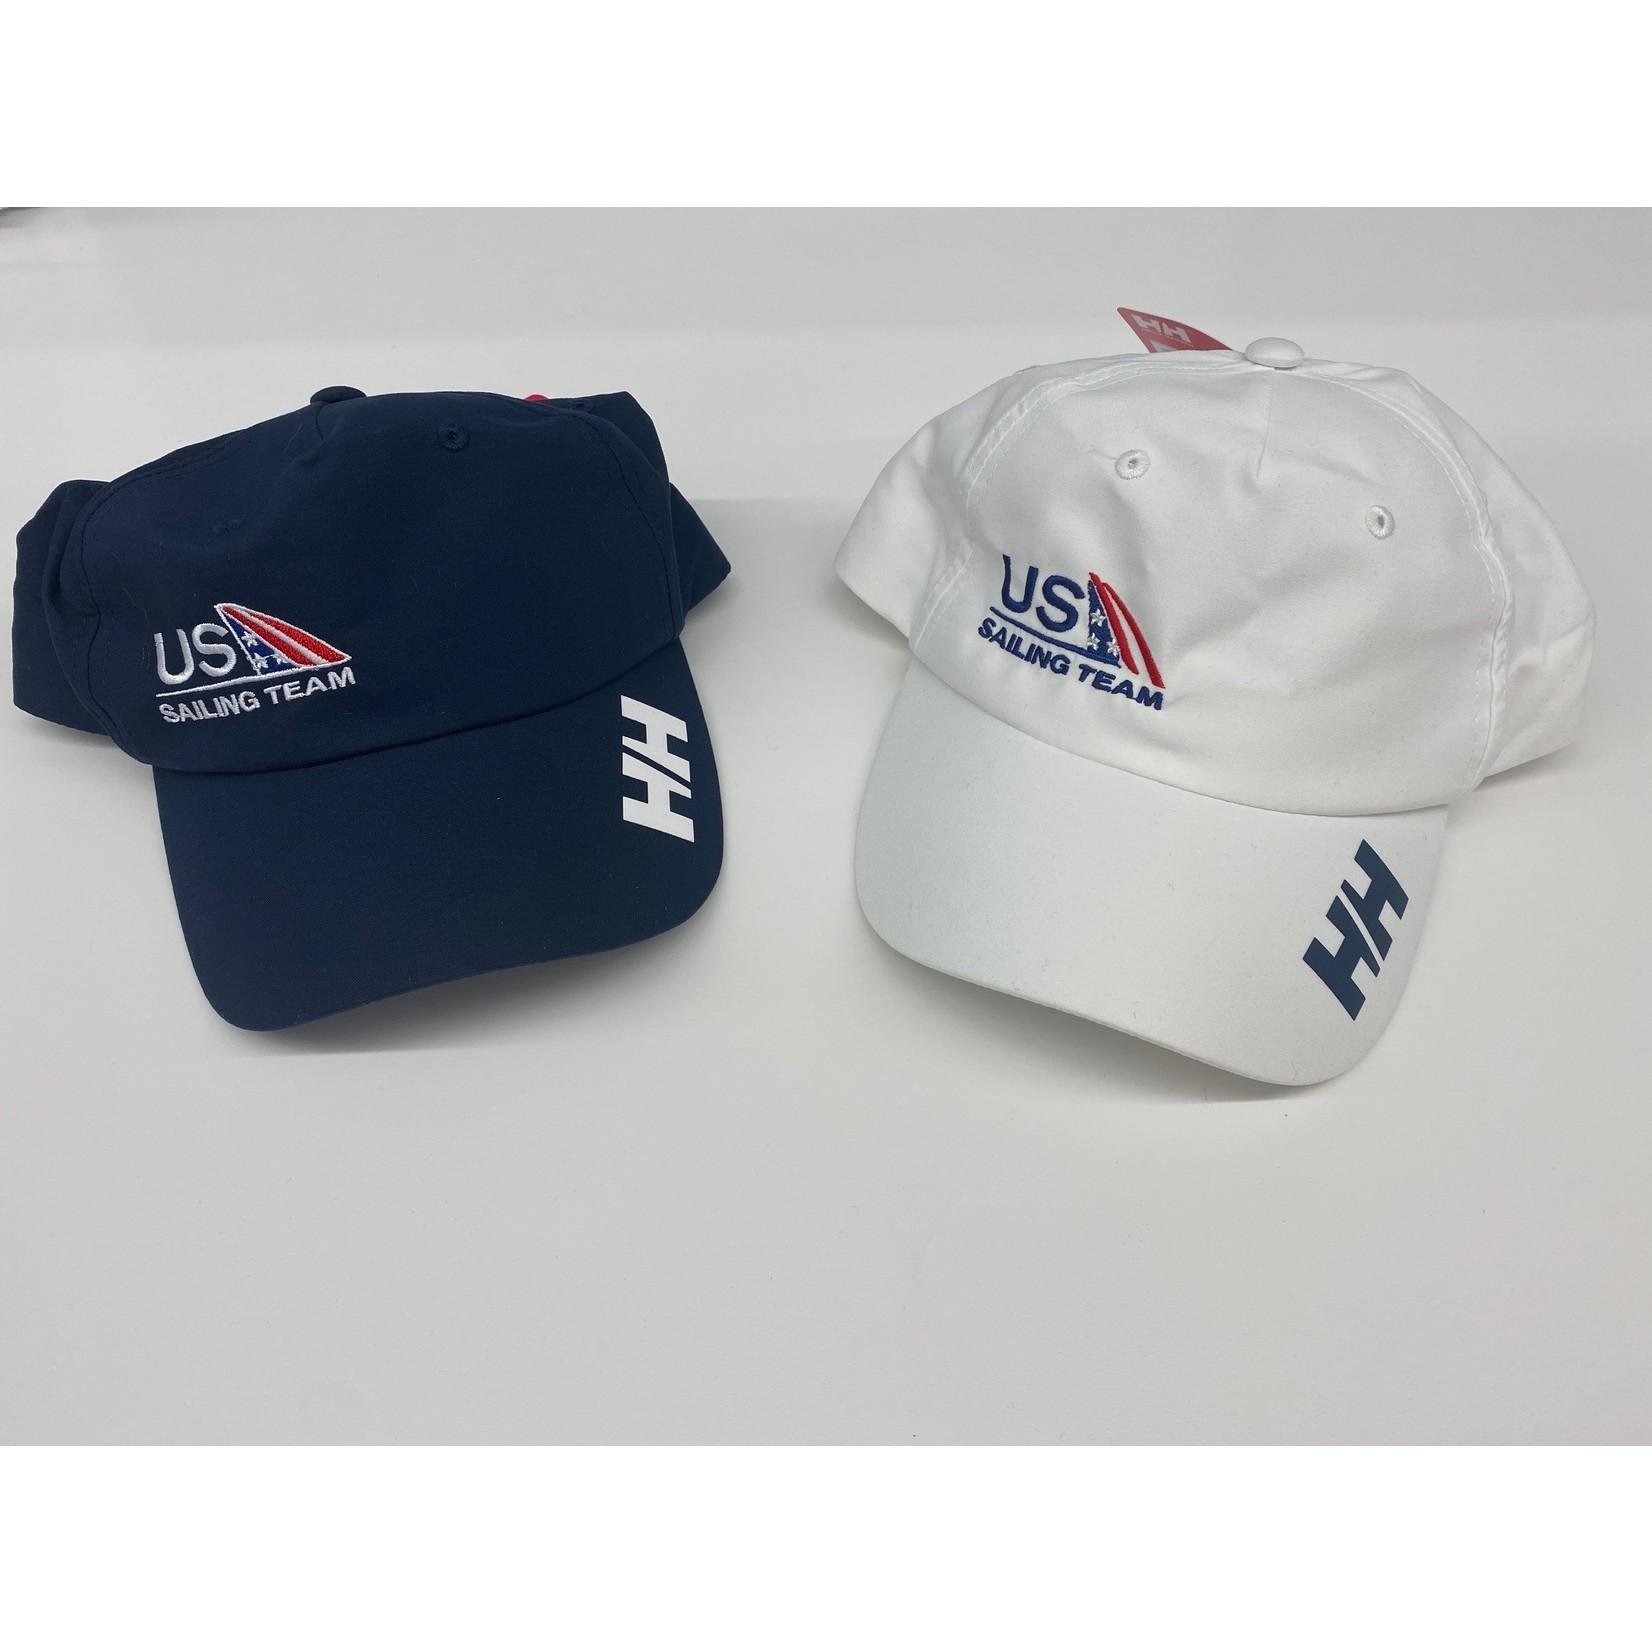 US Sailing Team Hat